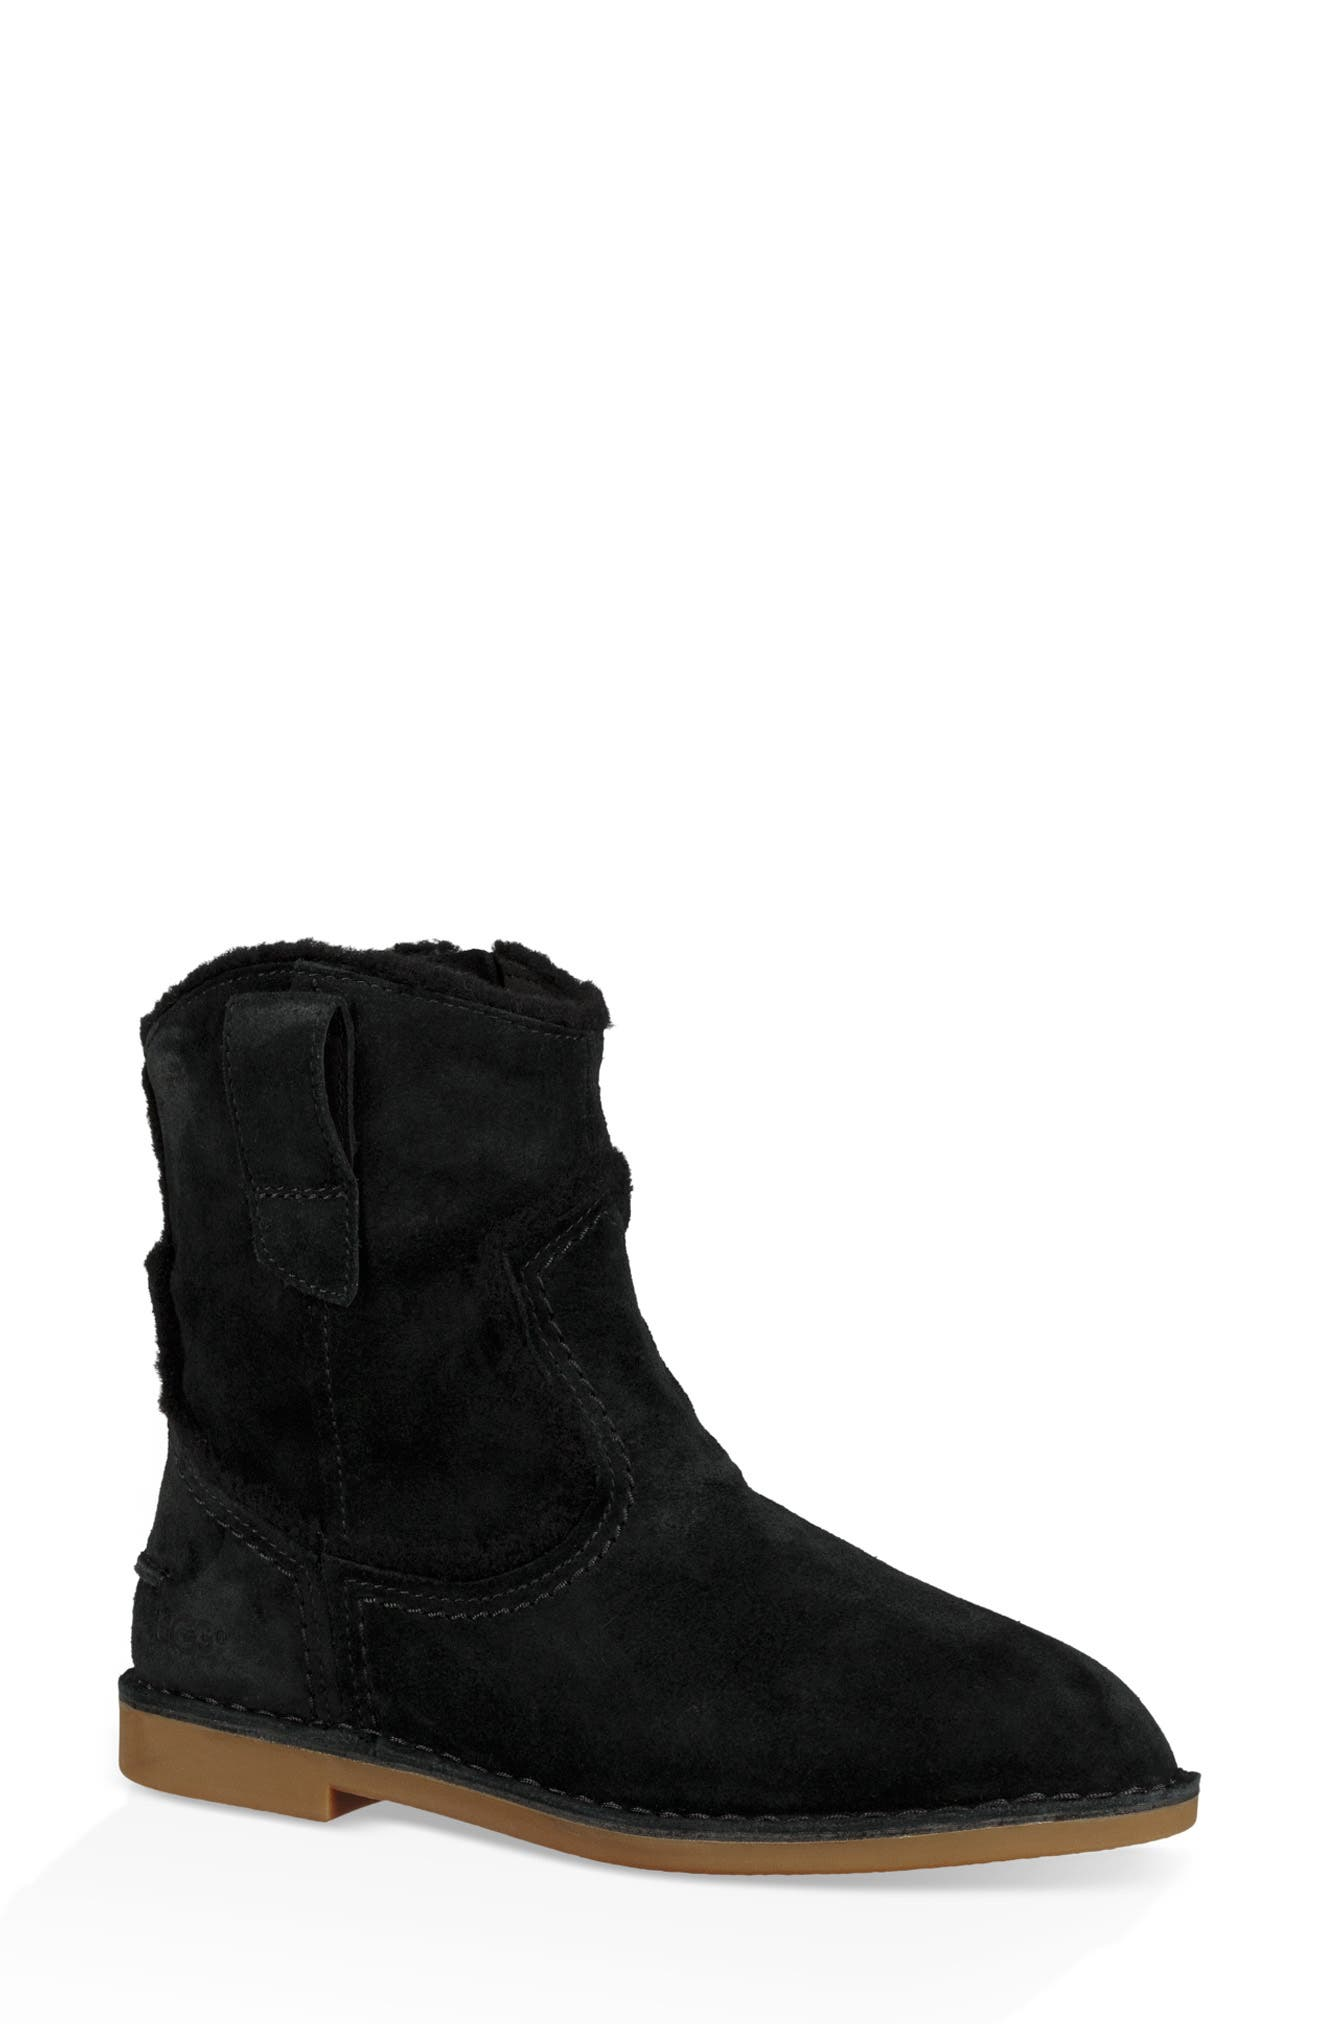 Ugg Catica Boot, Black